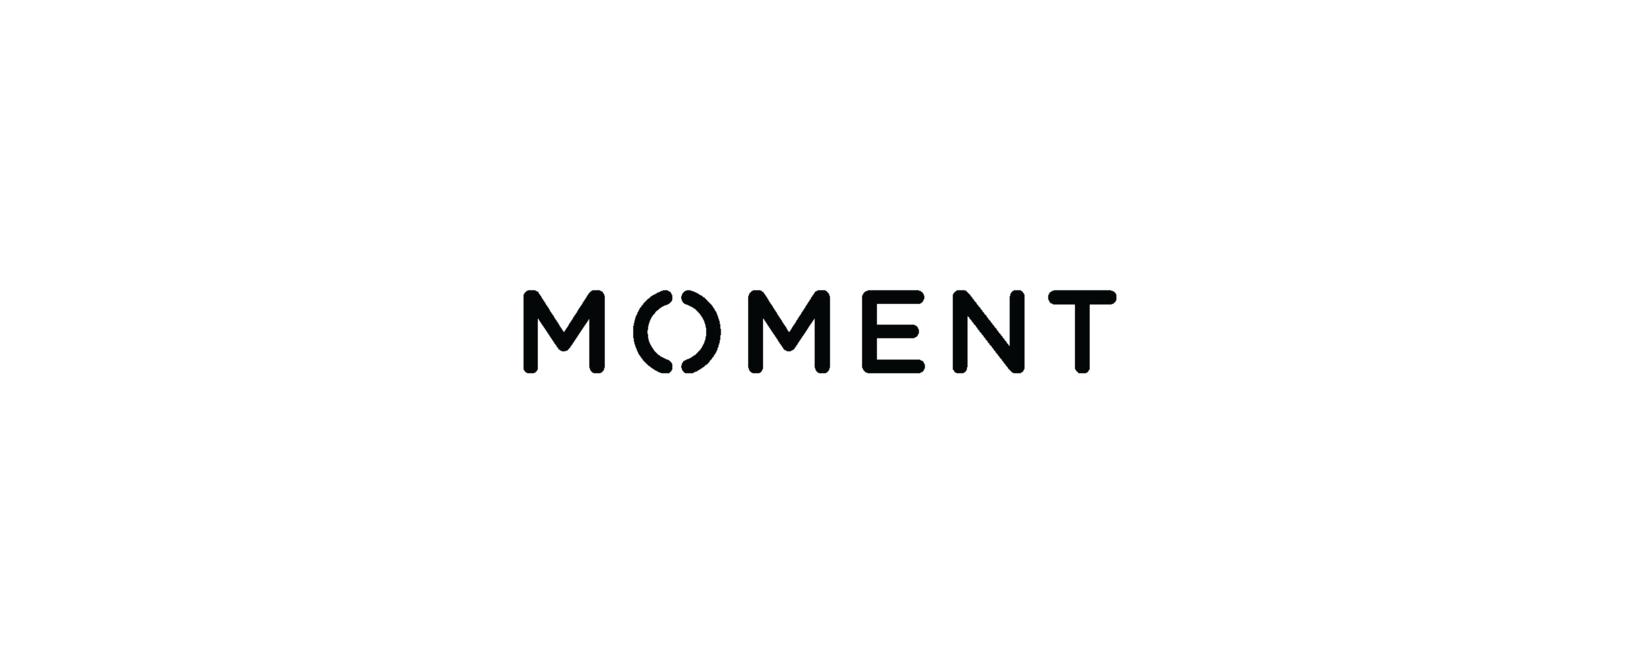 Moment Discount Code 2021